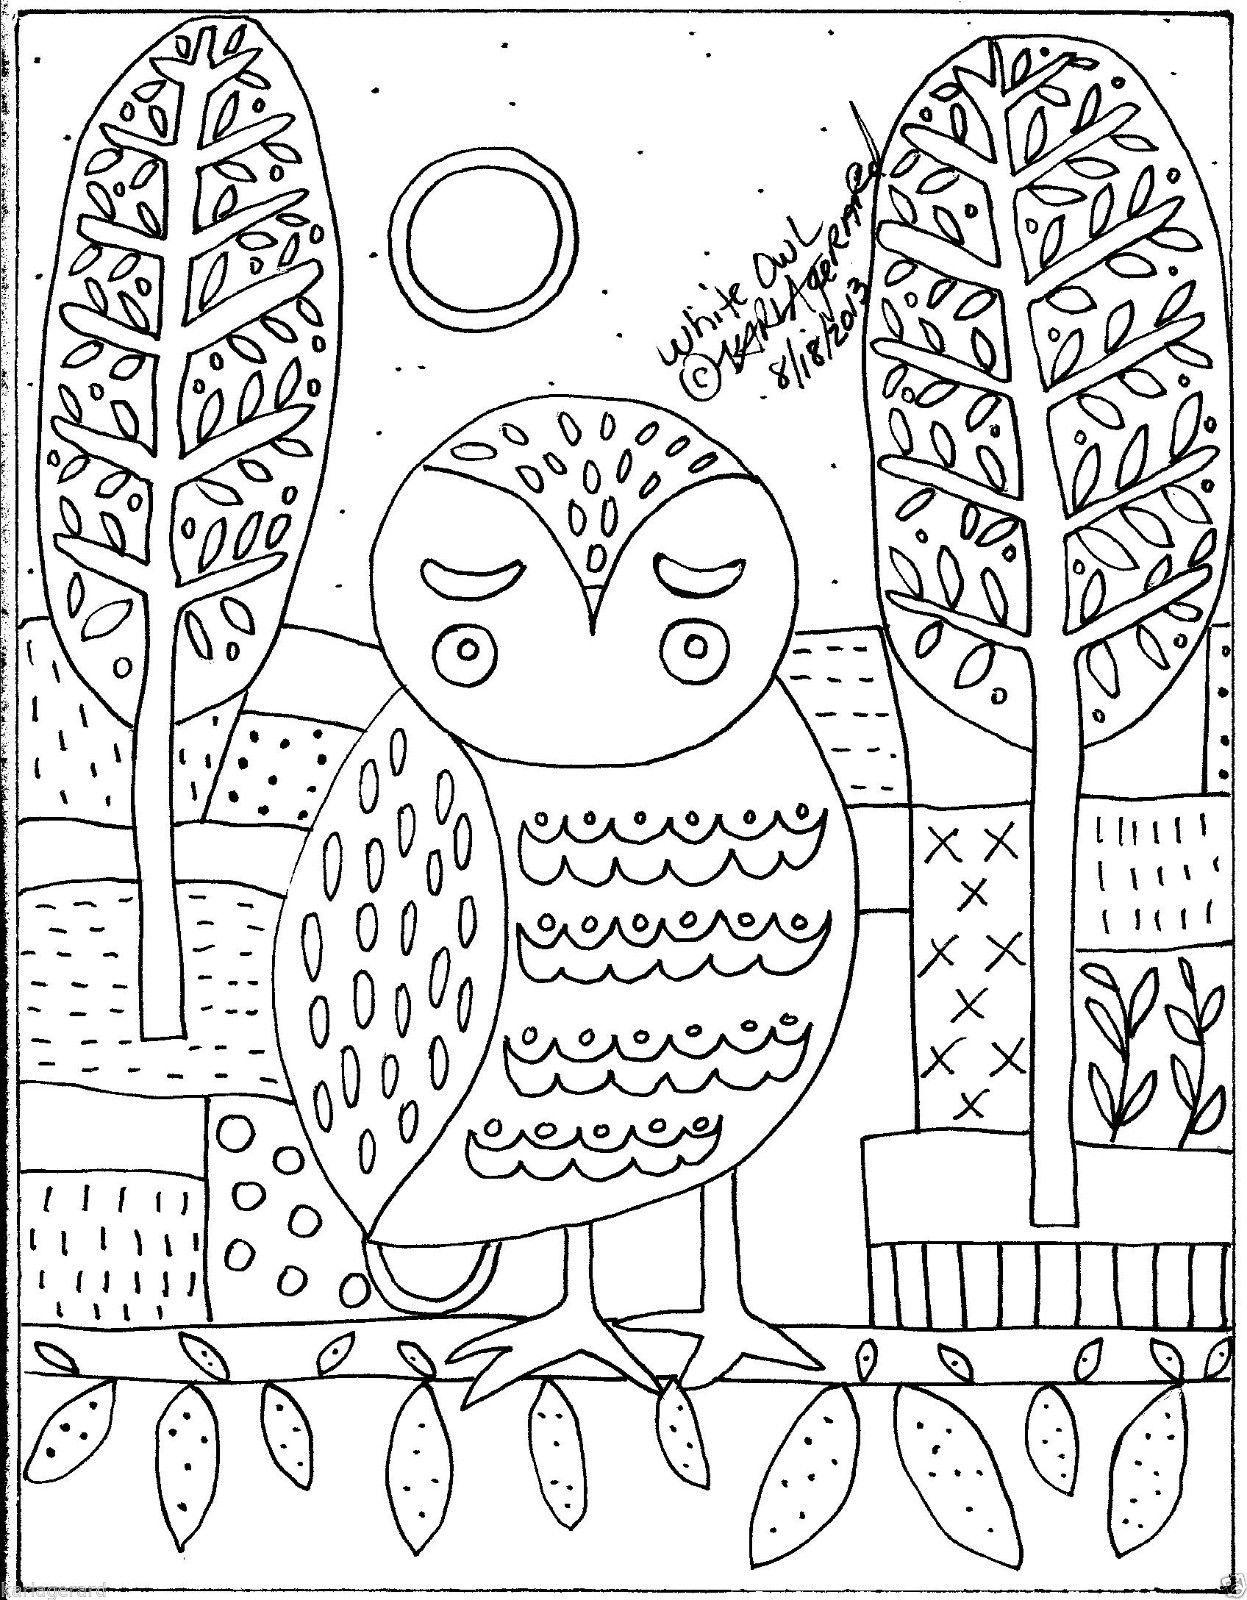 Rug hook crafts paper pattern white owl folk art abstract rug hook crafts paper pattern white owl folk art abstract primitive karla gerard ebay bankloansurffo Image collections